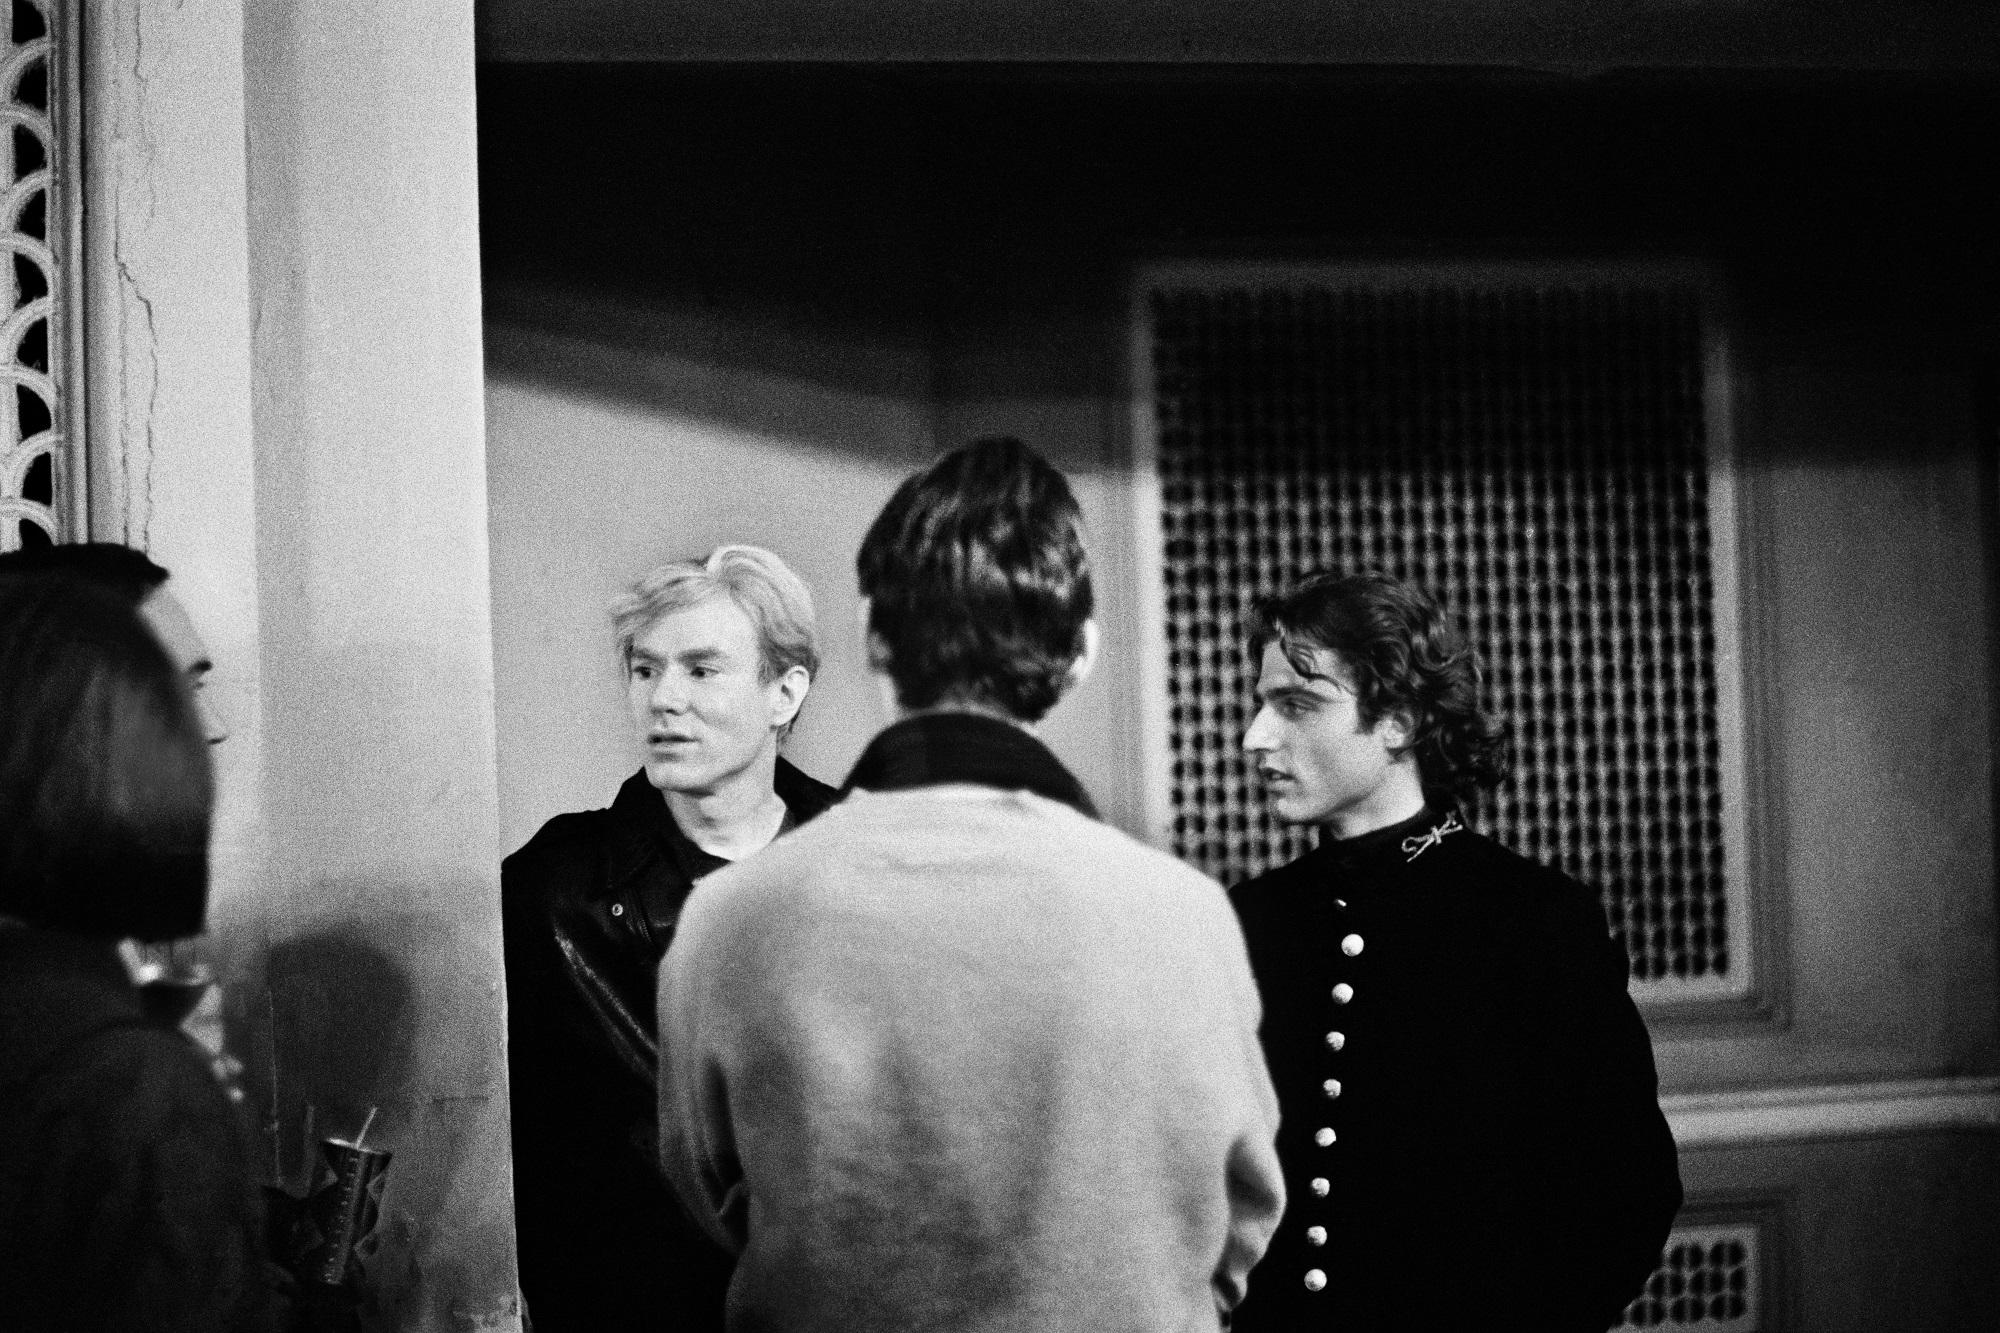 Andy Warhol and Gerard Malanga. Photo: The Estate of Sam Moskovitz